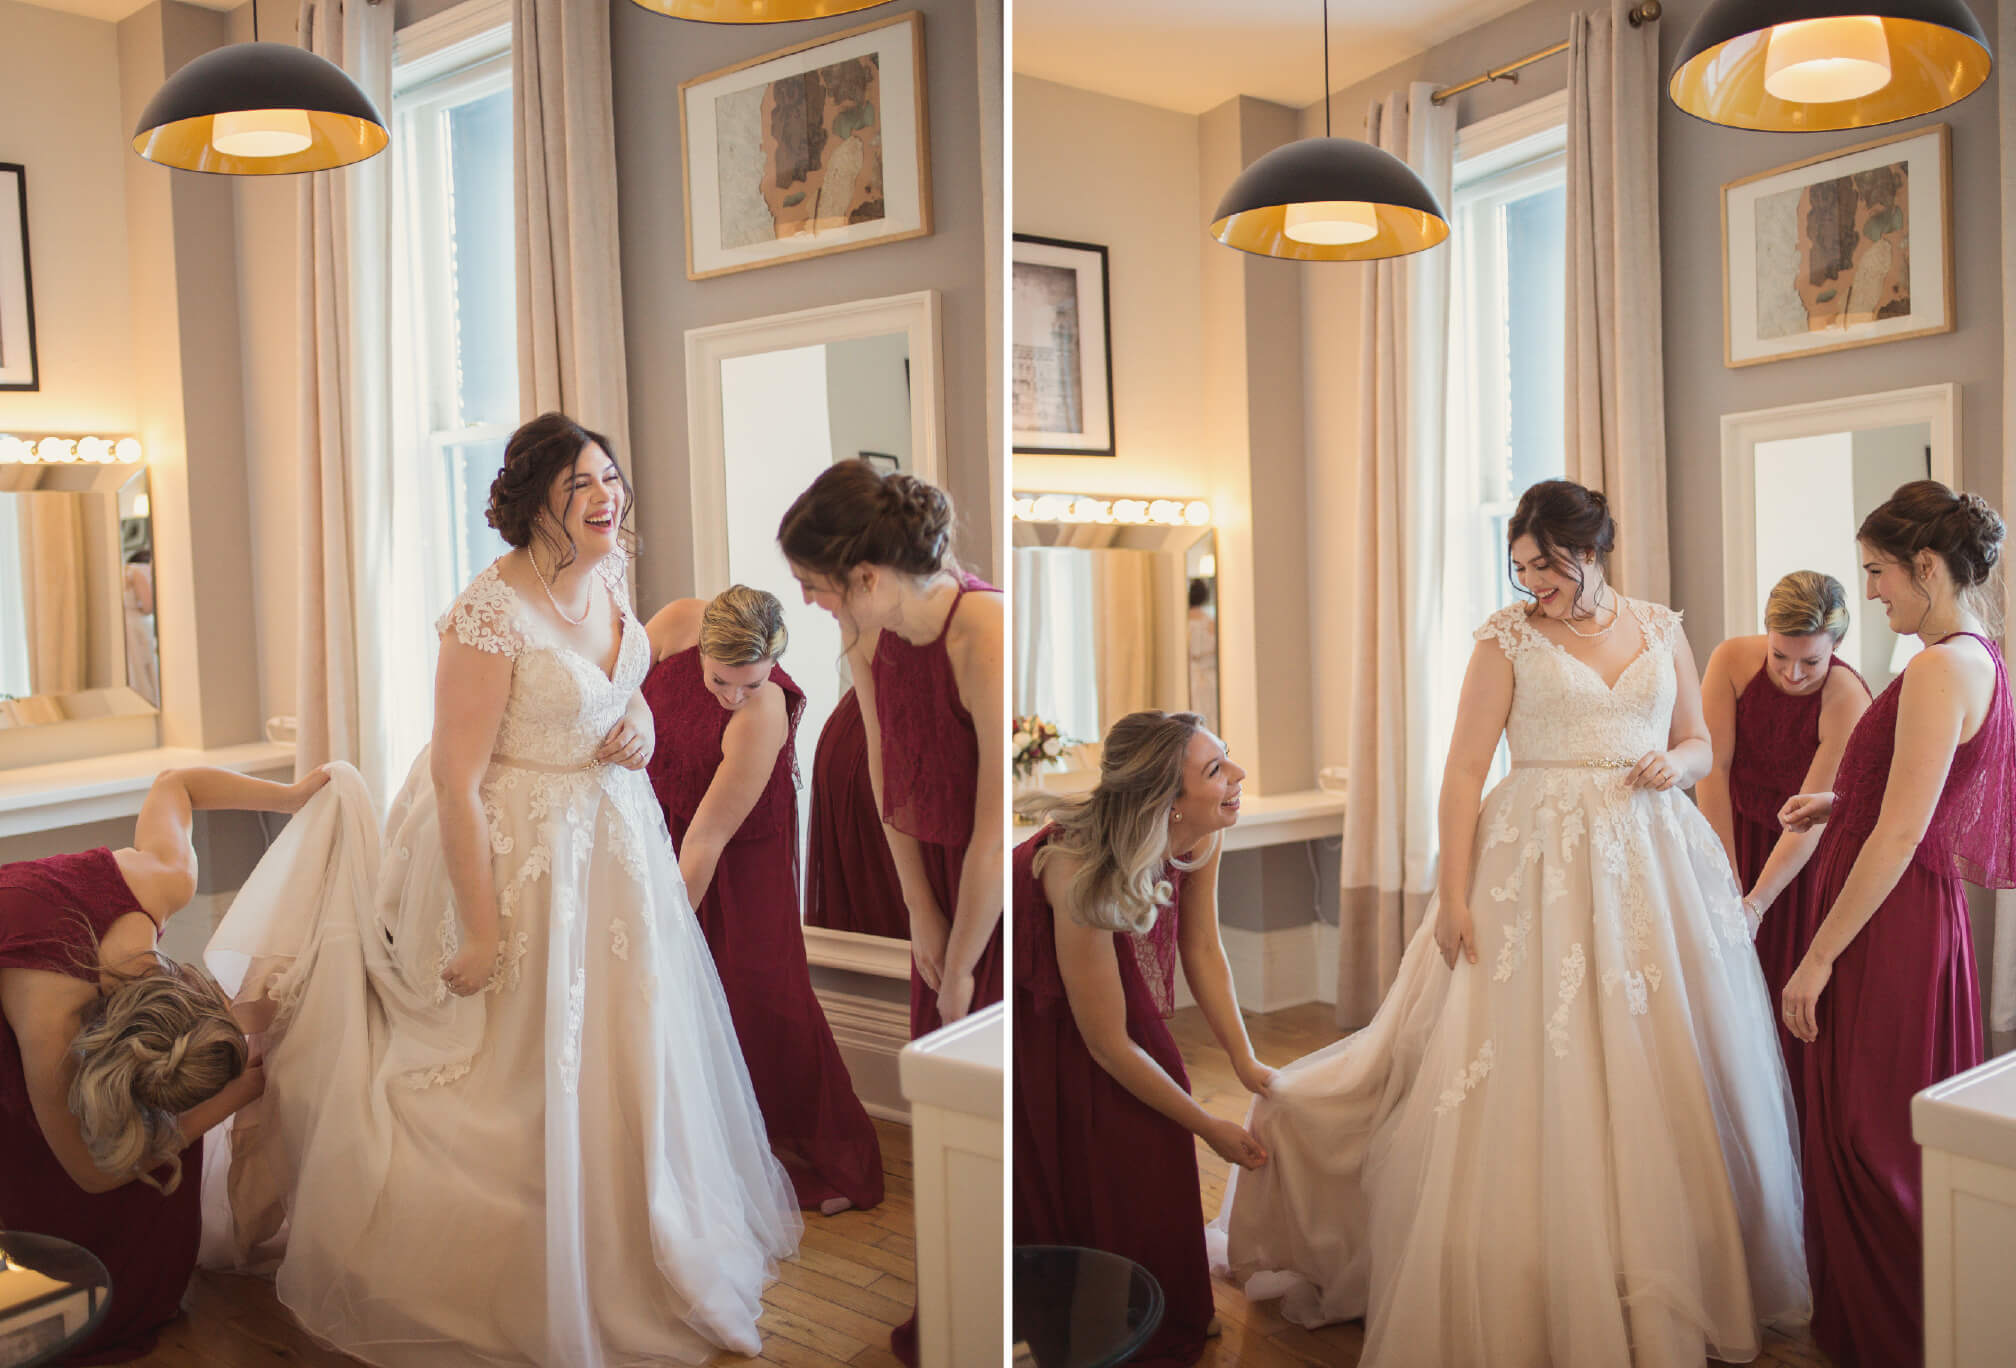 candid moment bridesmaids